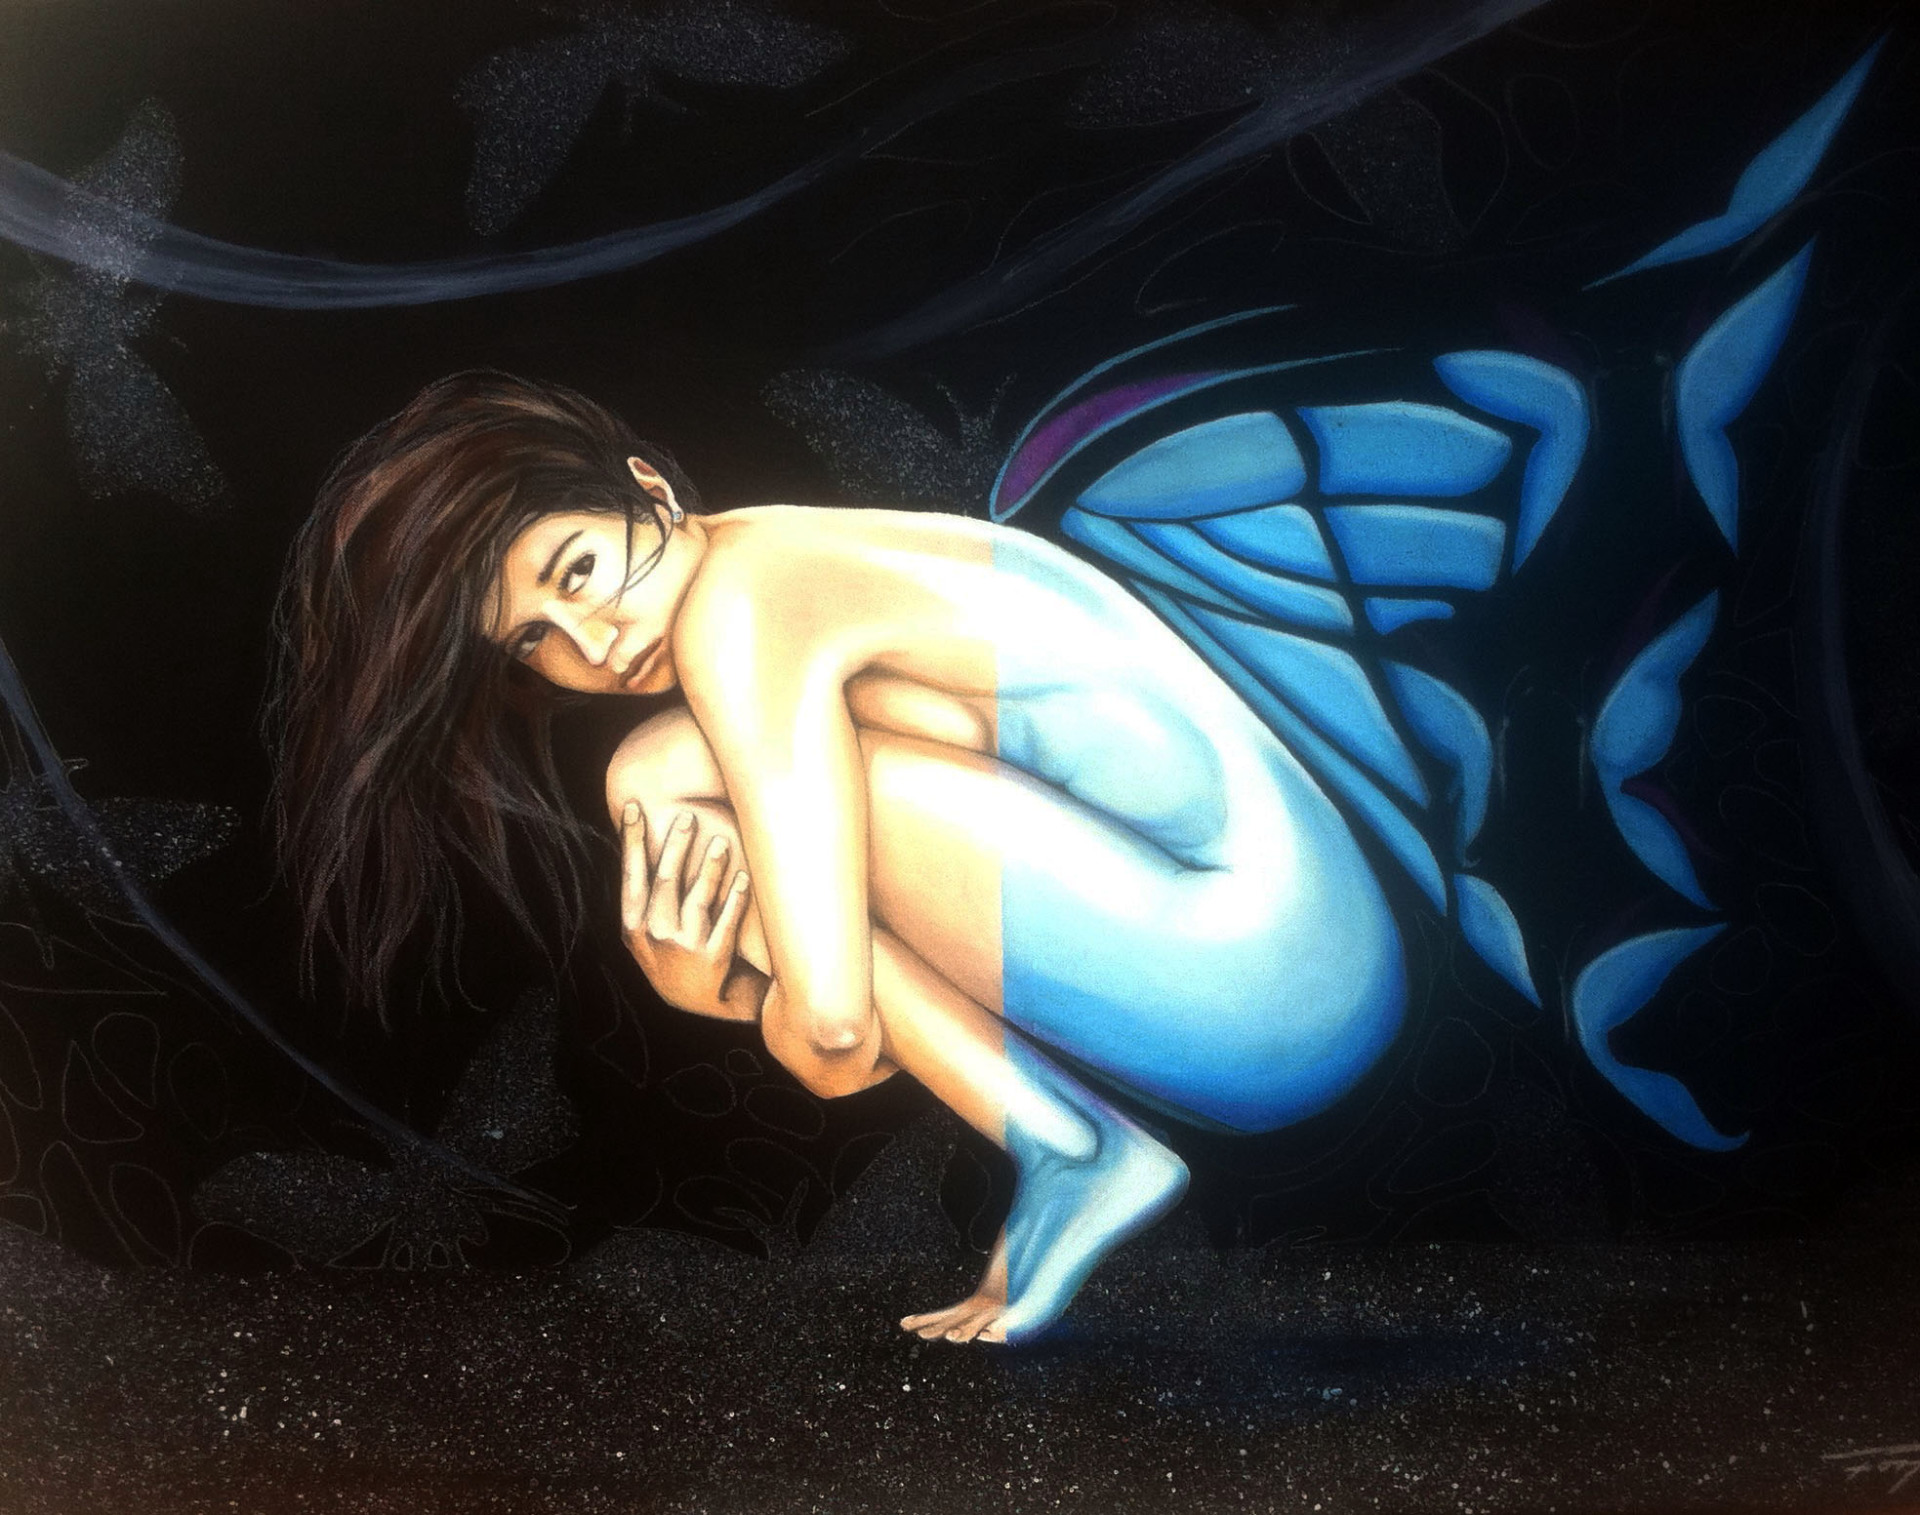 """Por volar antes de tiempo""   2011 40""x30""  Oil pastel on canvas   Private collection"